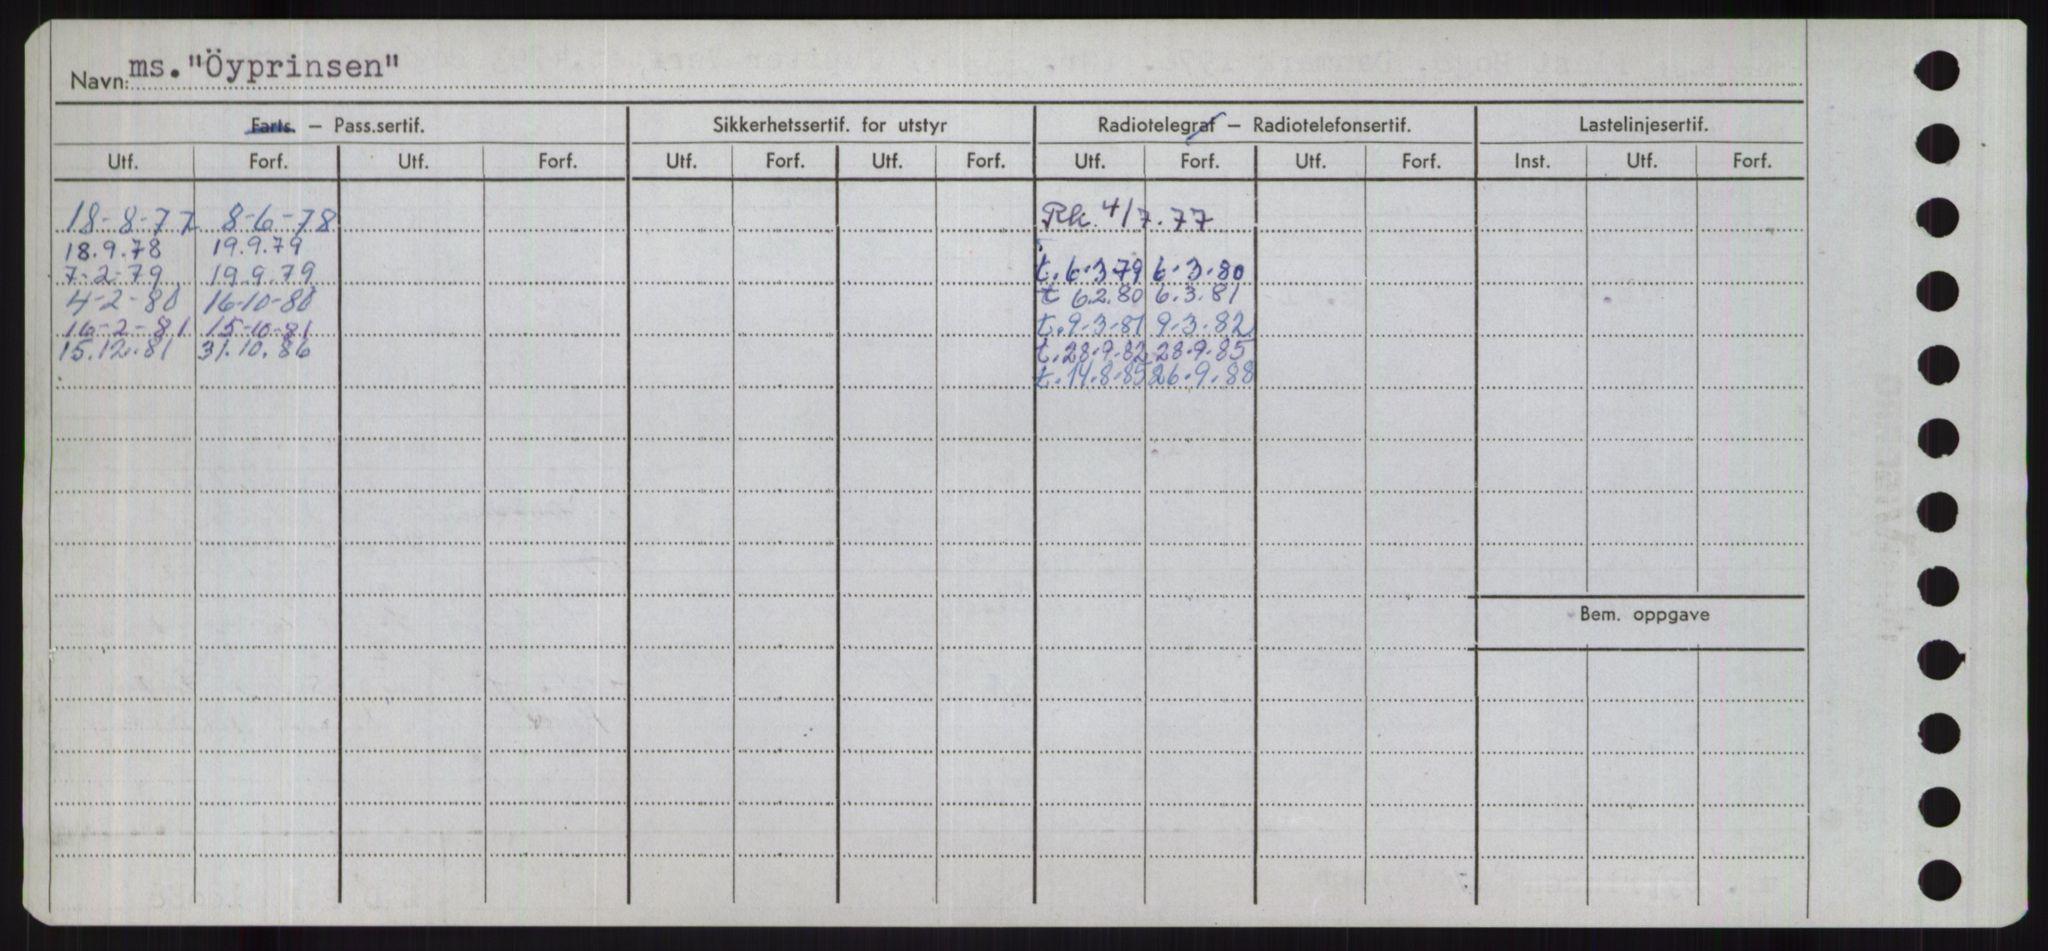 RA, Sjøfartsdirektoratet med forløpere, Skipsmålingen, H/Ha/L0006: Fartøy, Sver-Å, s. 837